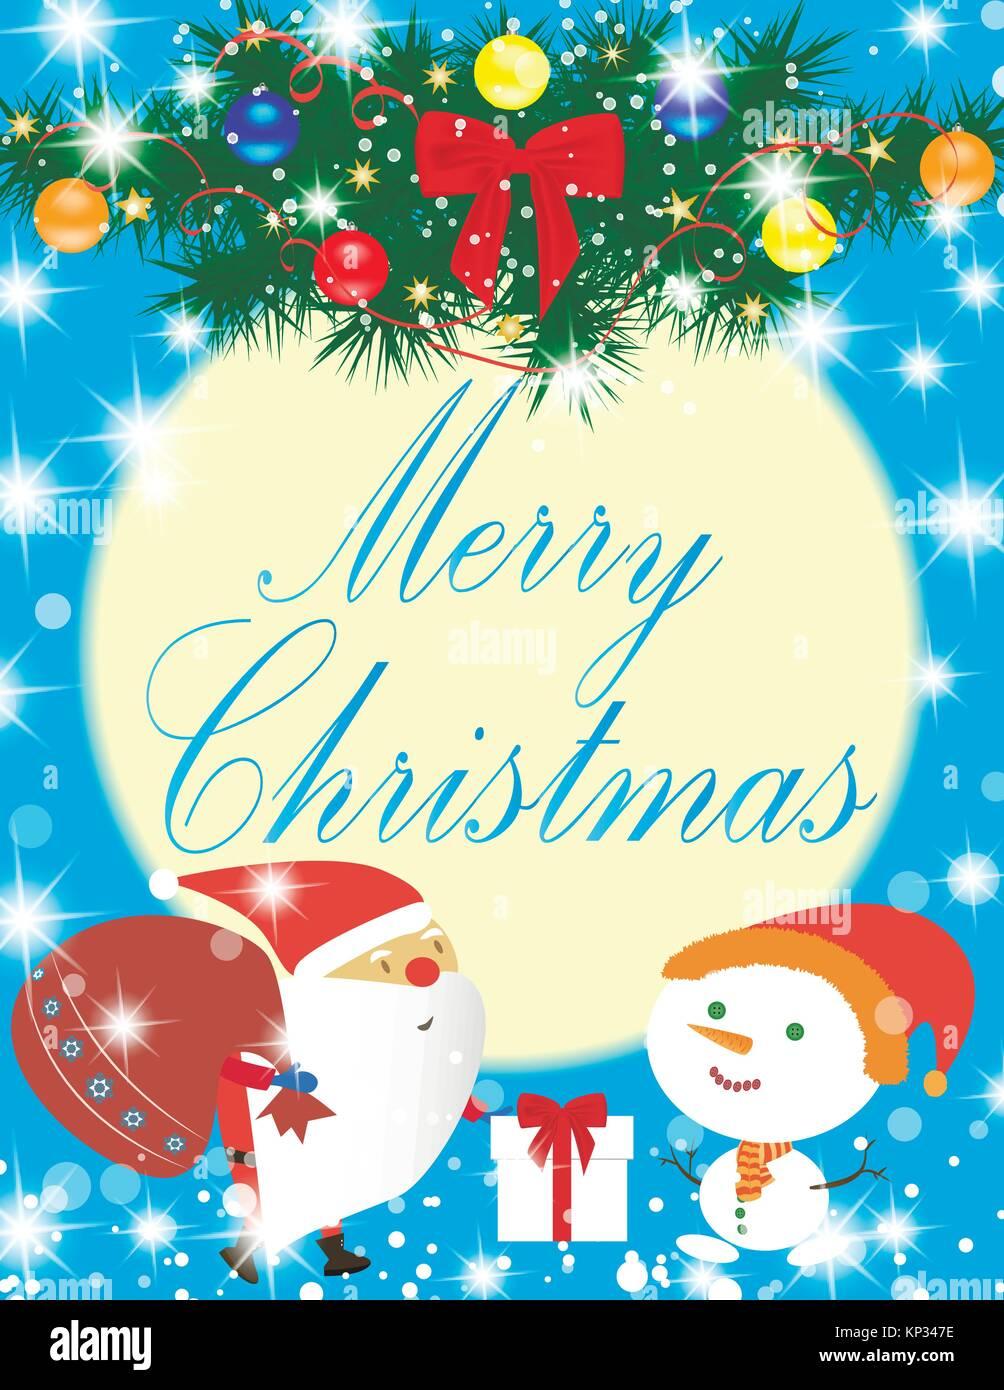 Merry Christmas Card Stock Vector Art Illustration Vector Image